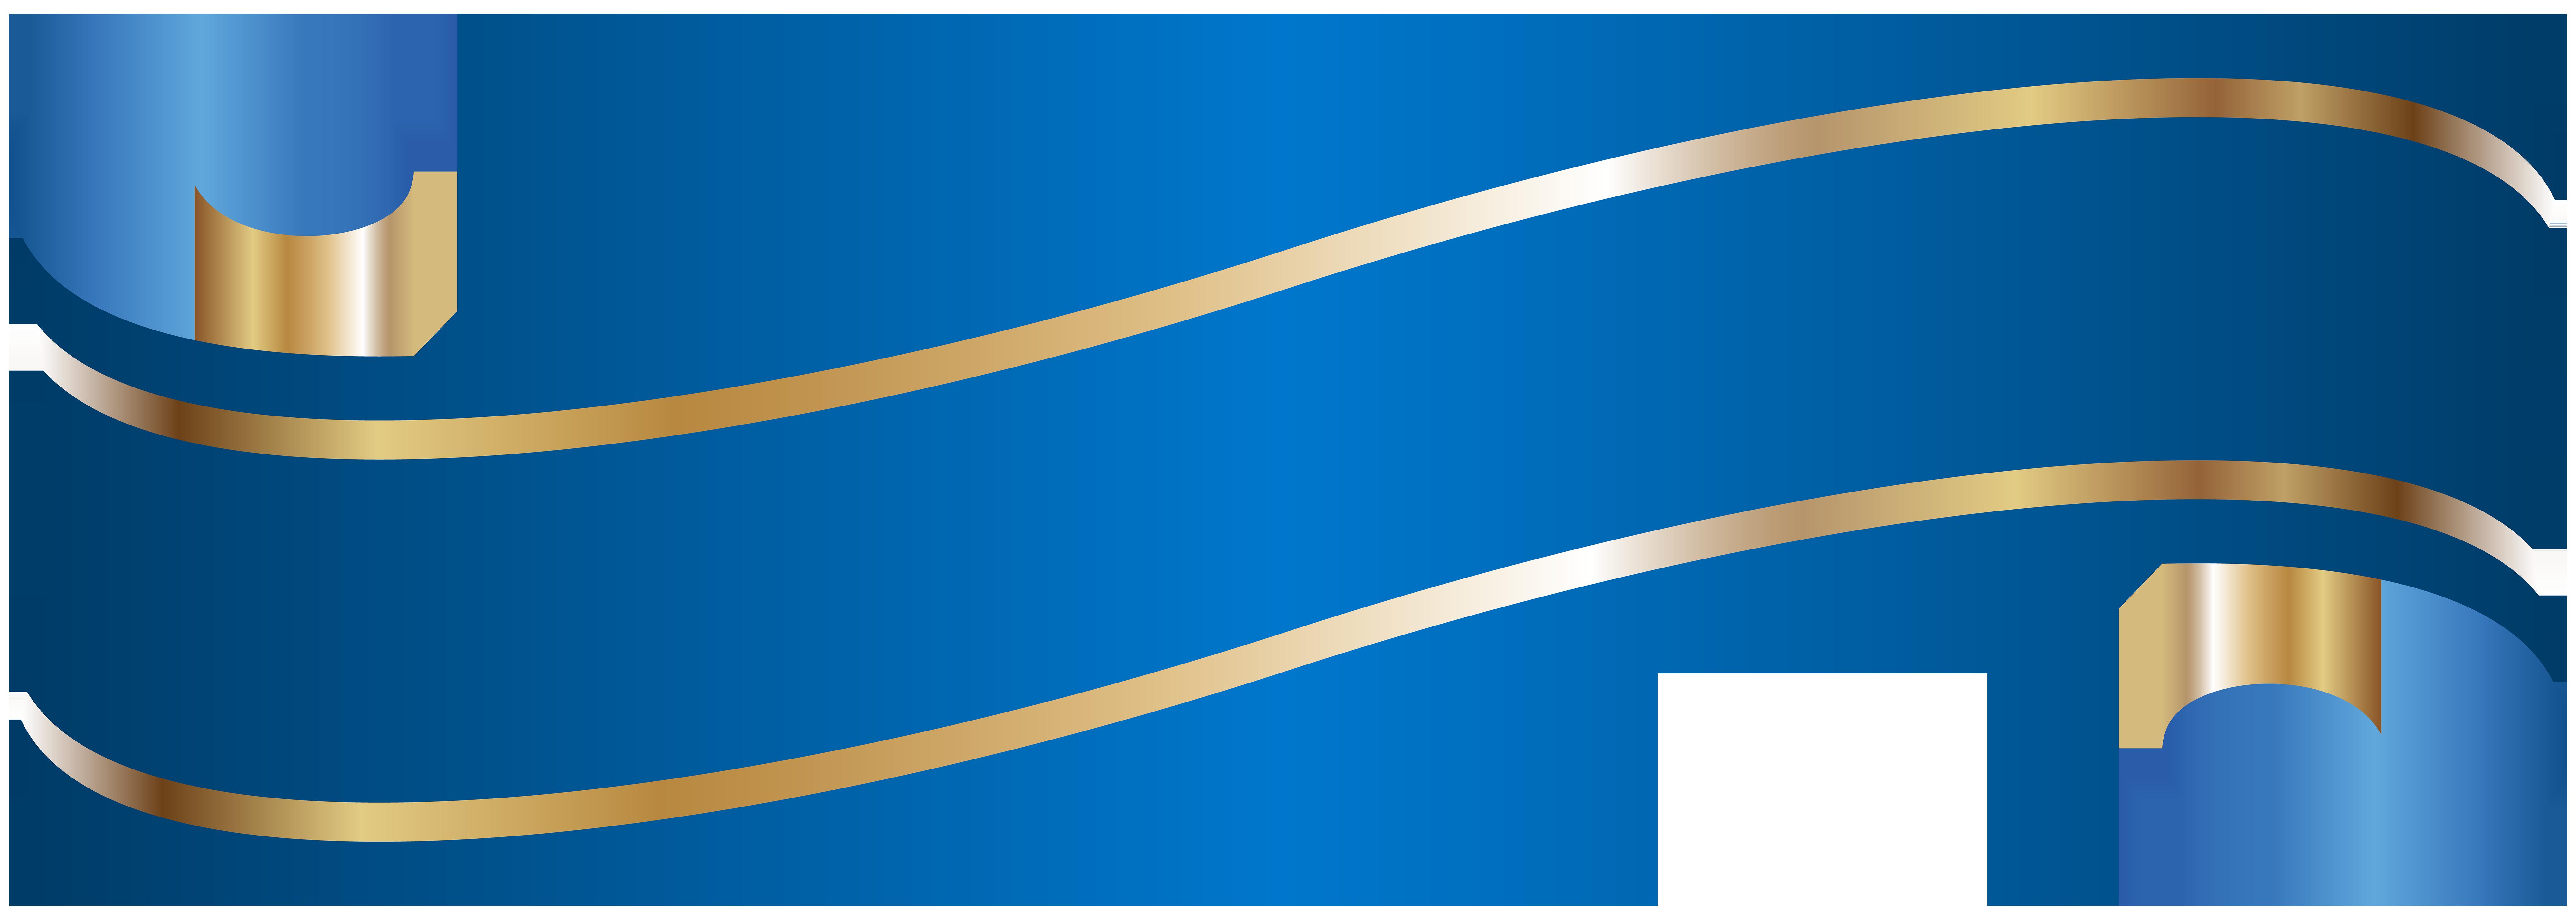 picture freeuse download Banners transparent line. Elegant banner blue png